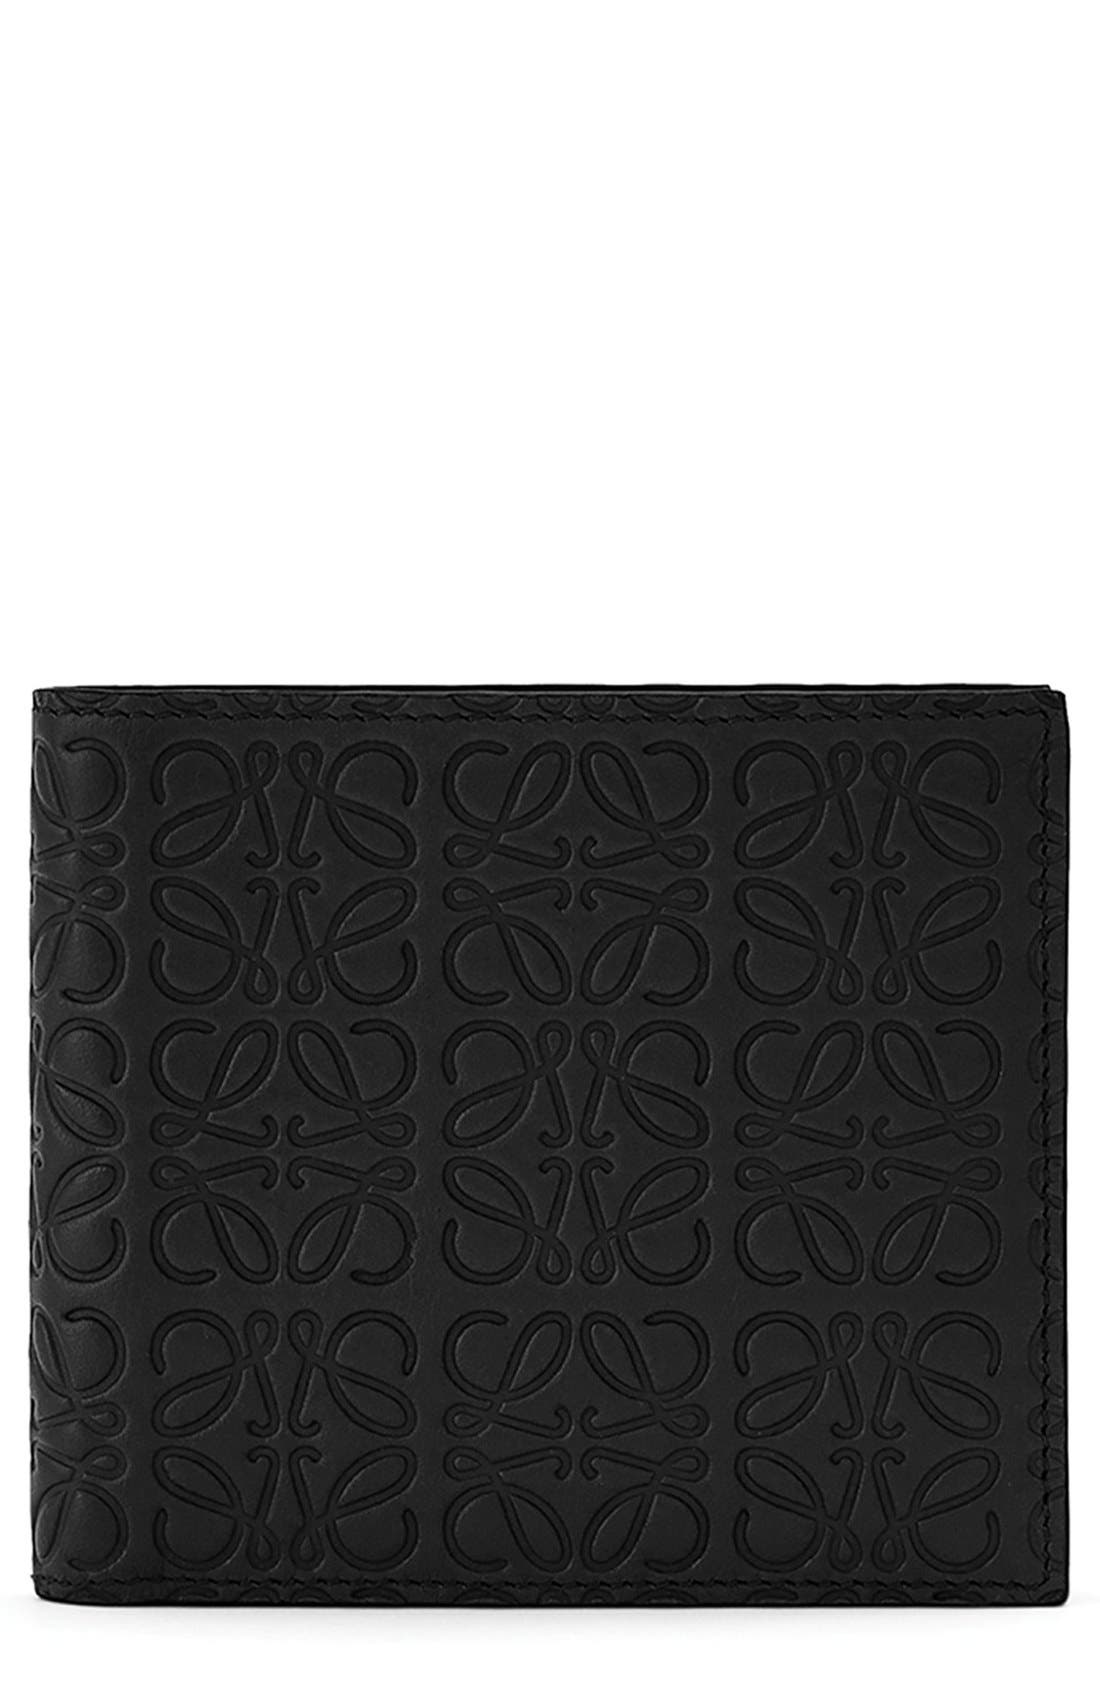 Main Image - Loewe Logo Embossed Calfskin Leather Bifold Wallet